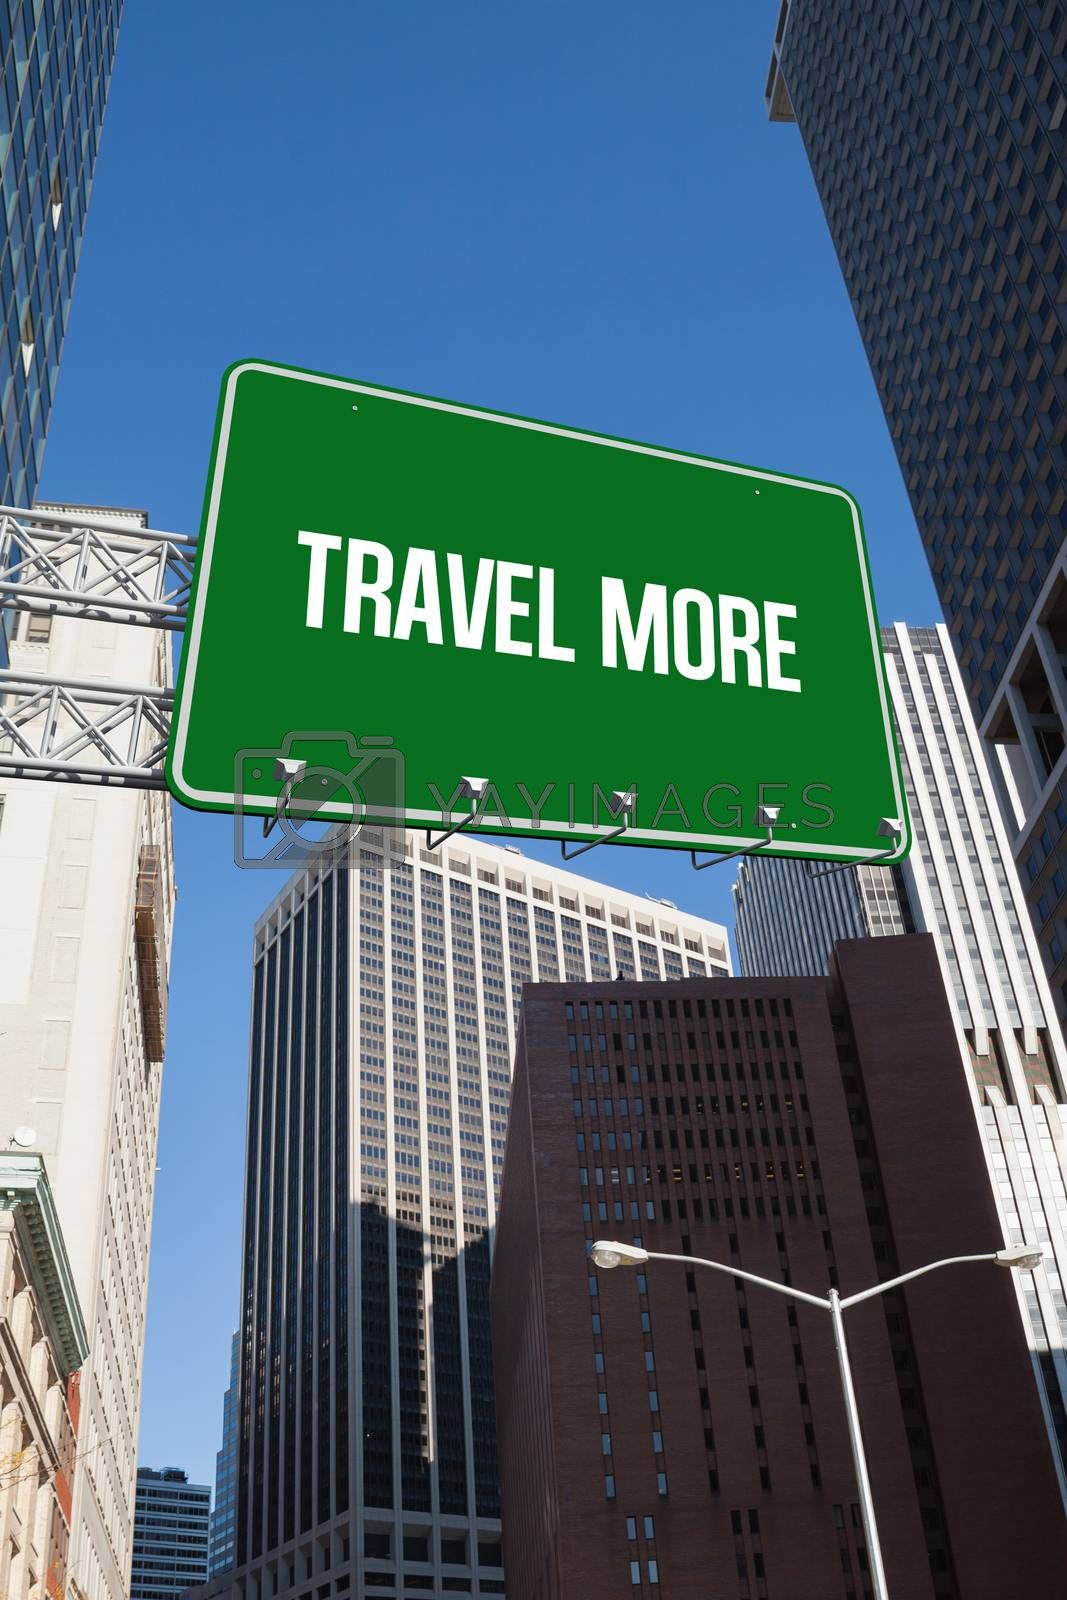 Travel more against new york by Wavebreakmedia